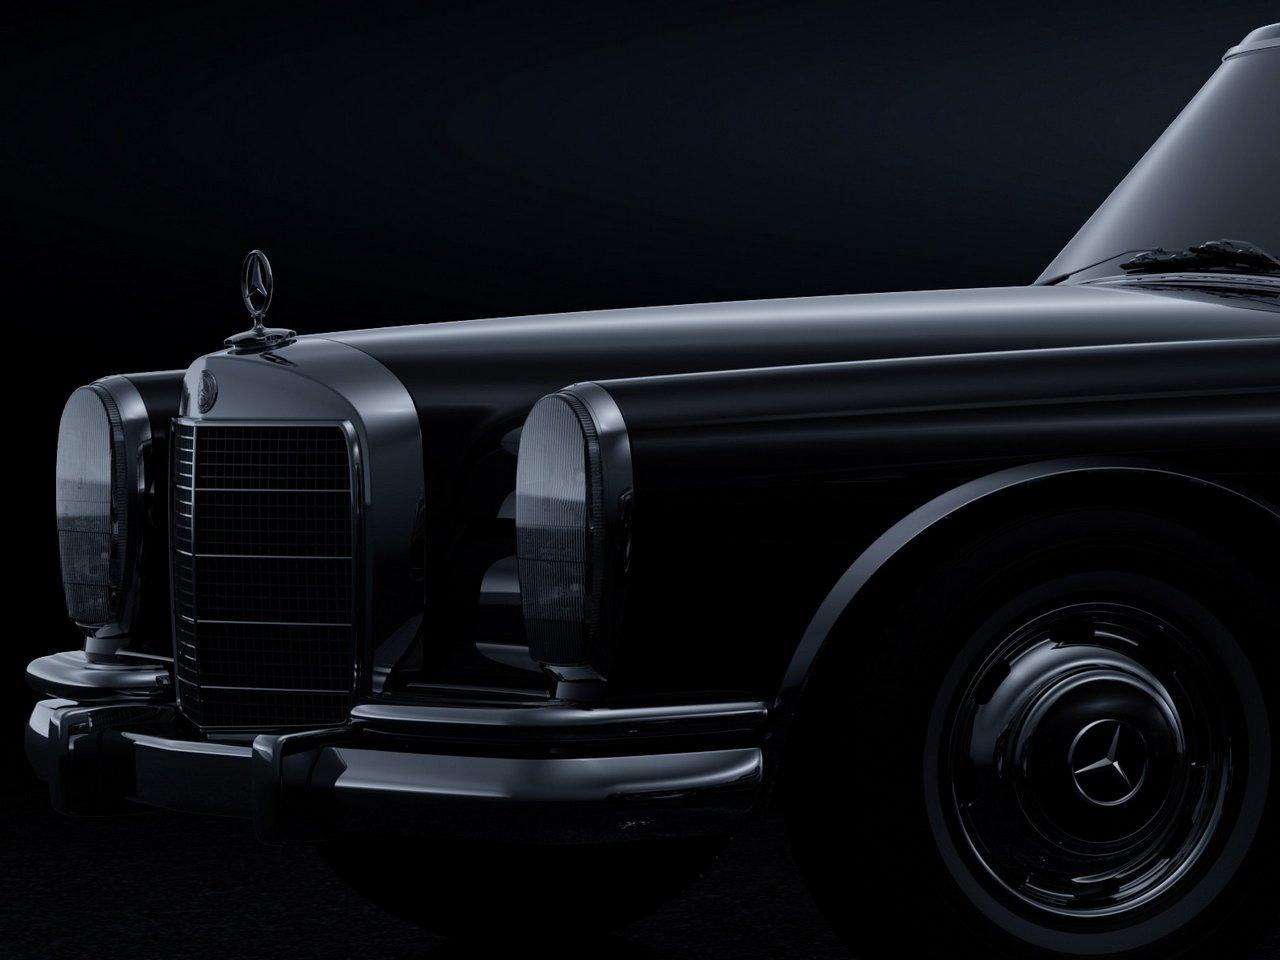 Mercedes-Maybach Pullman (VV 222) 2015